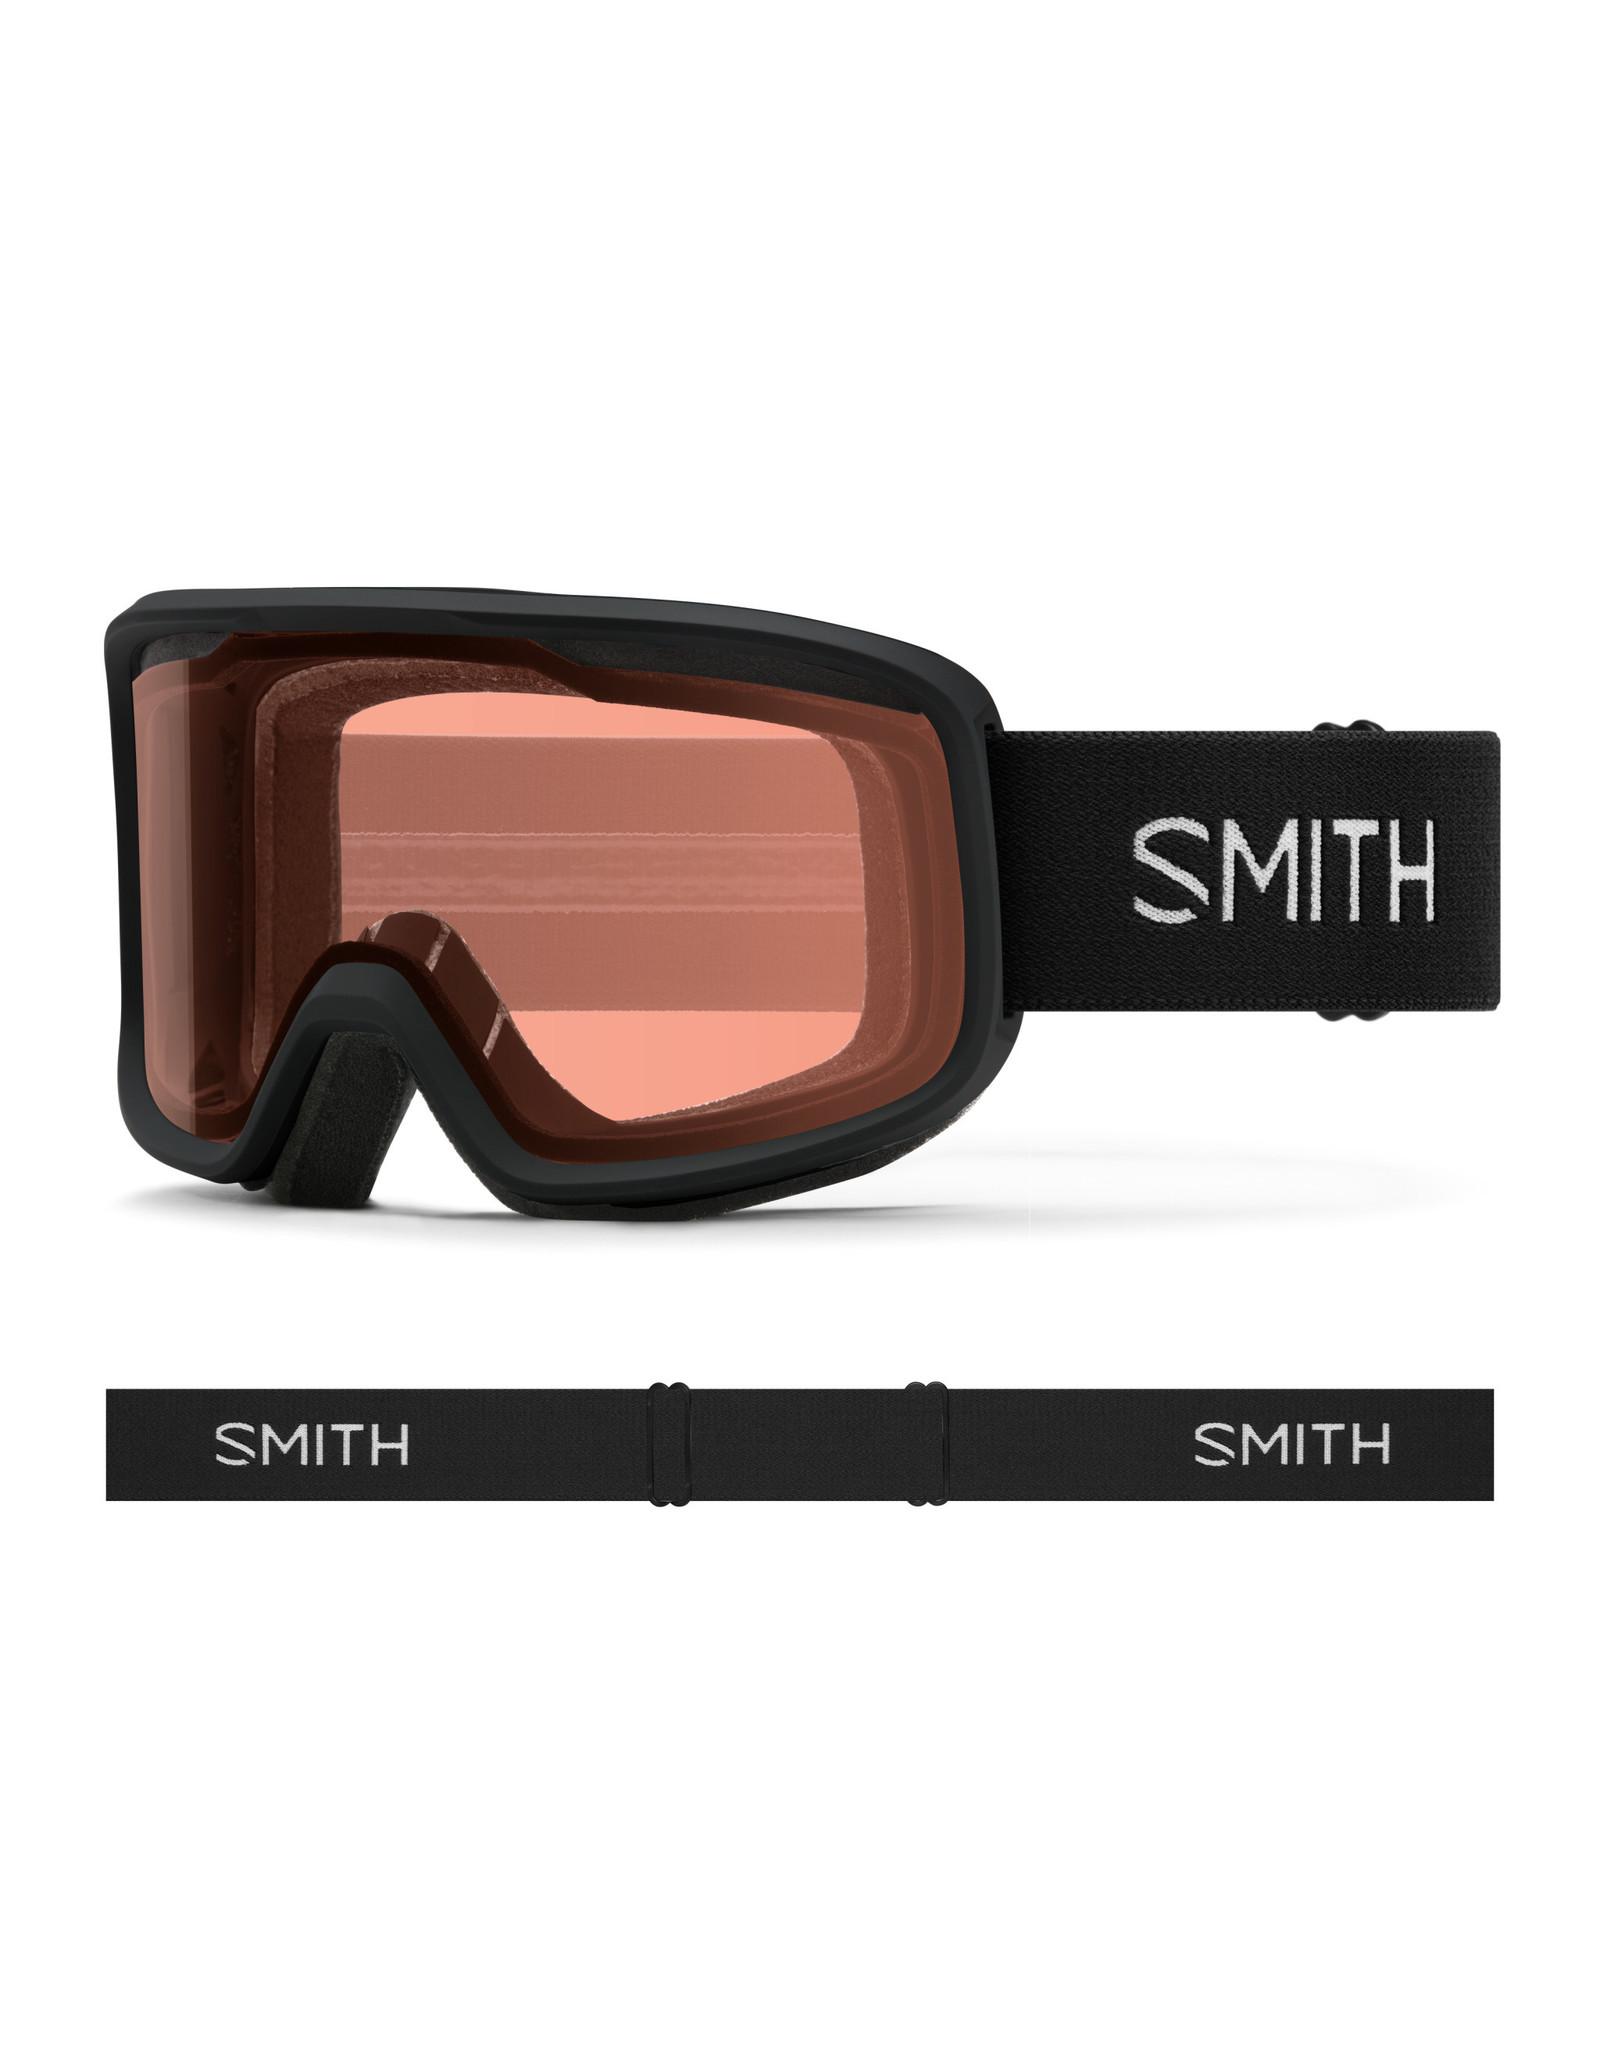 Smith SMITH FRONTIER BLACK 20